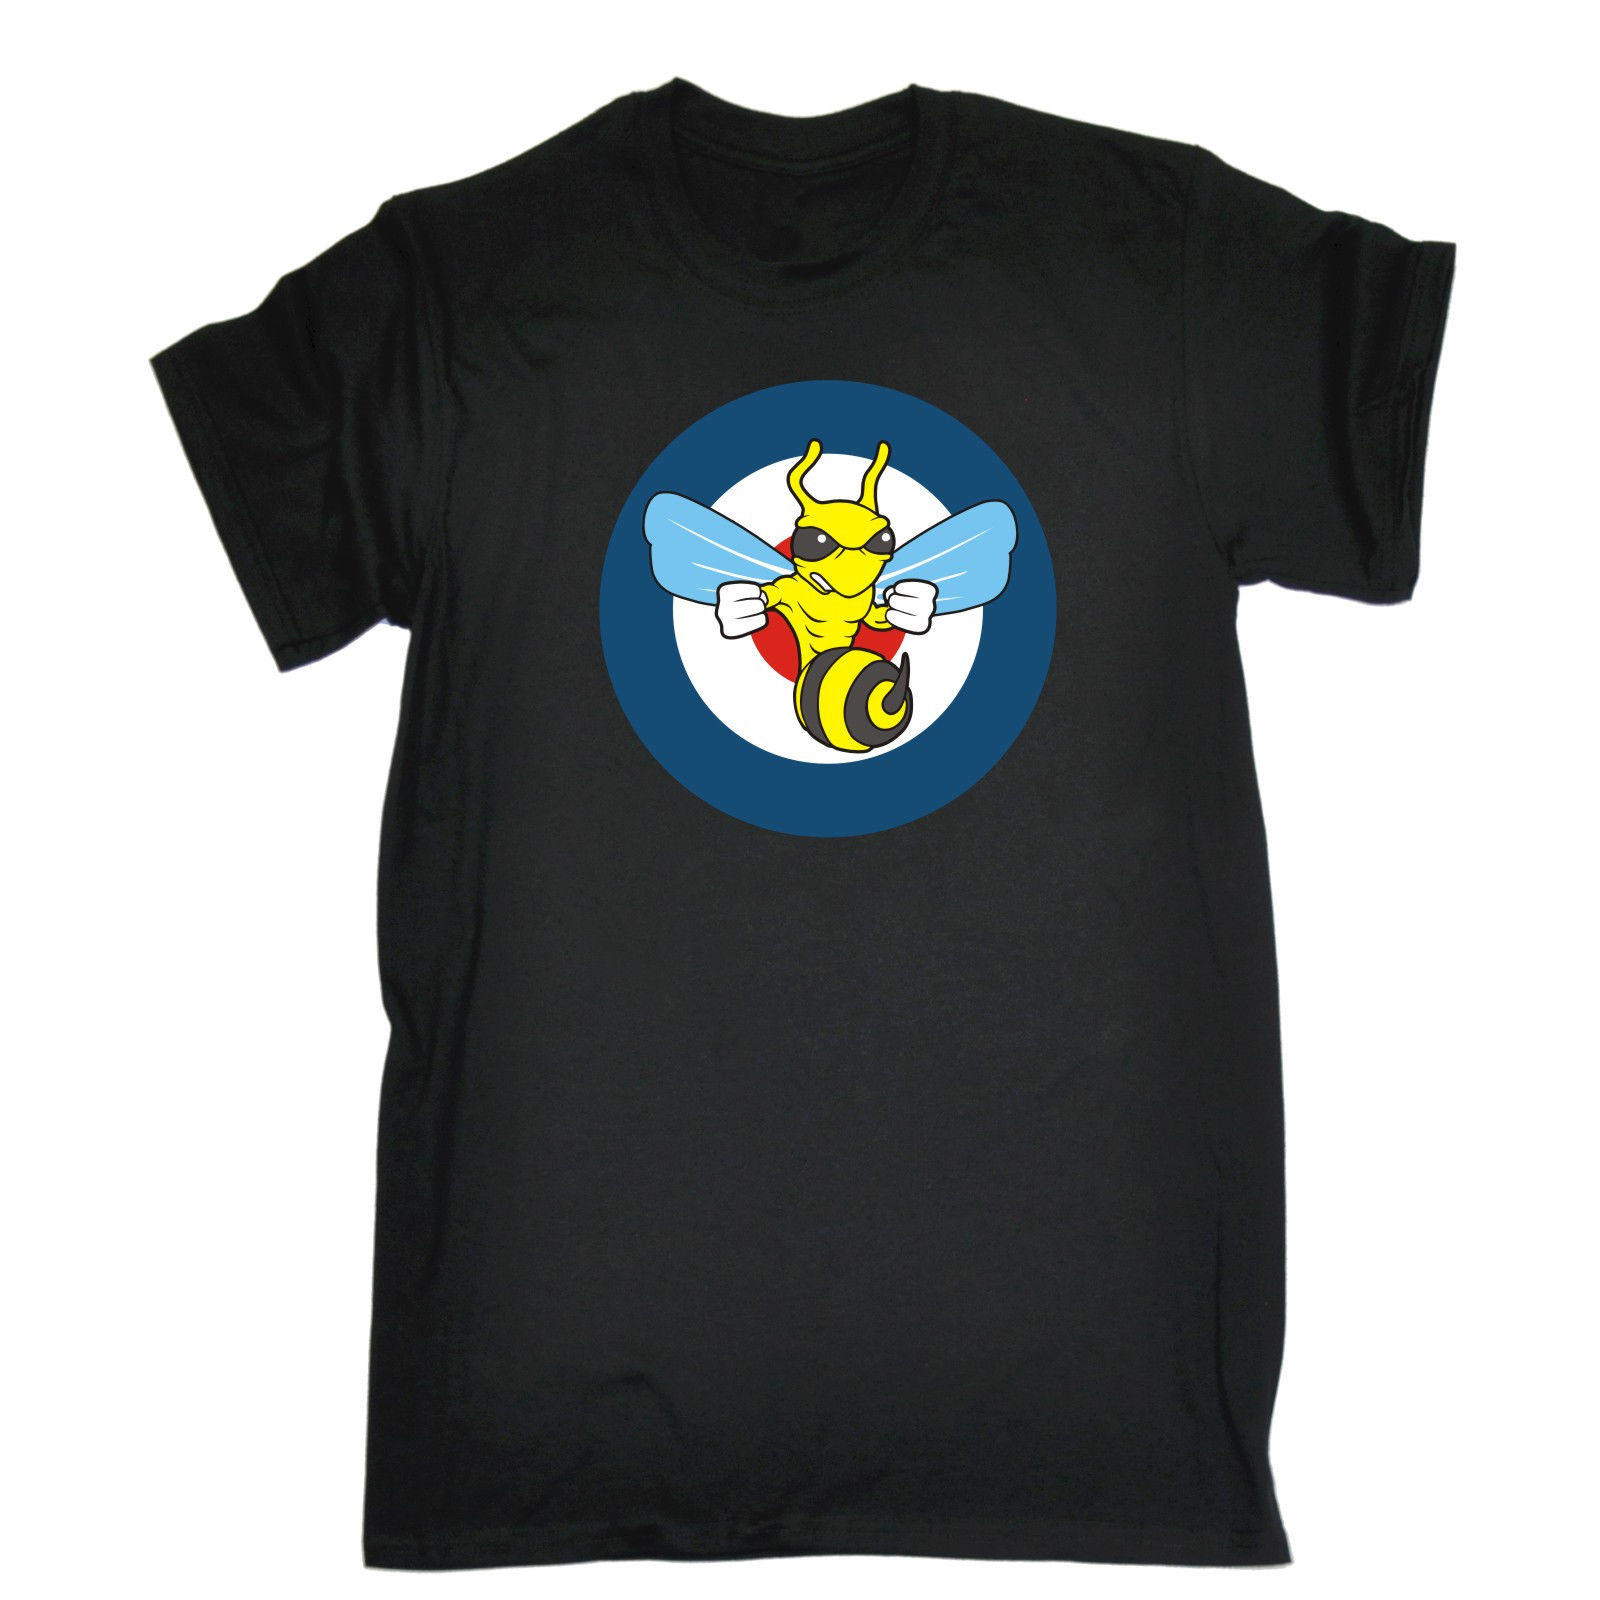 Black t shirt target - Target Fighting Wasp T Shirt Tee Joke Humour Funny Birthday Gift Present Him 2017 Short